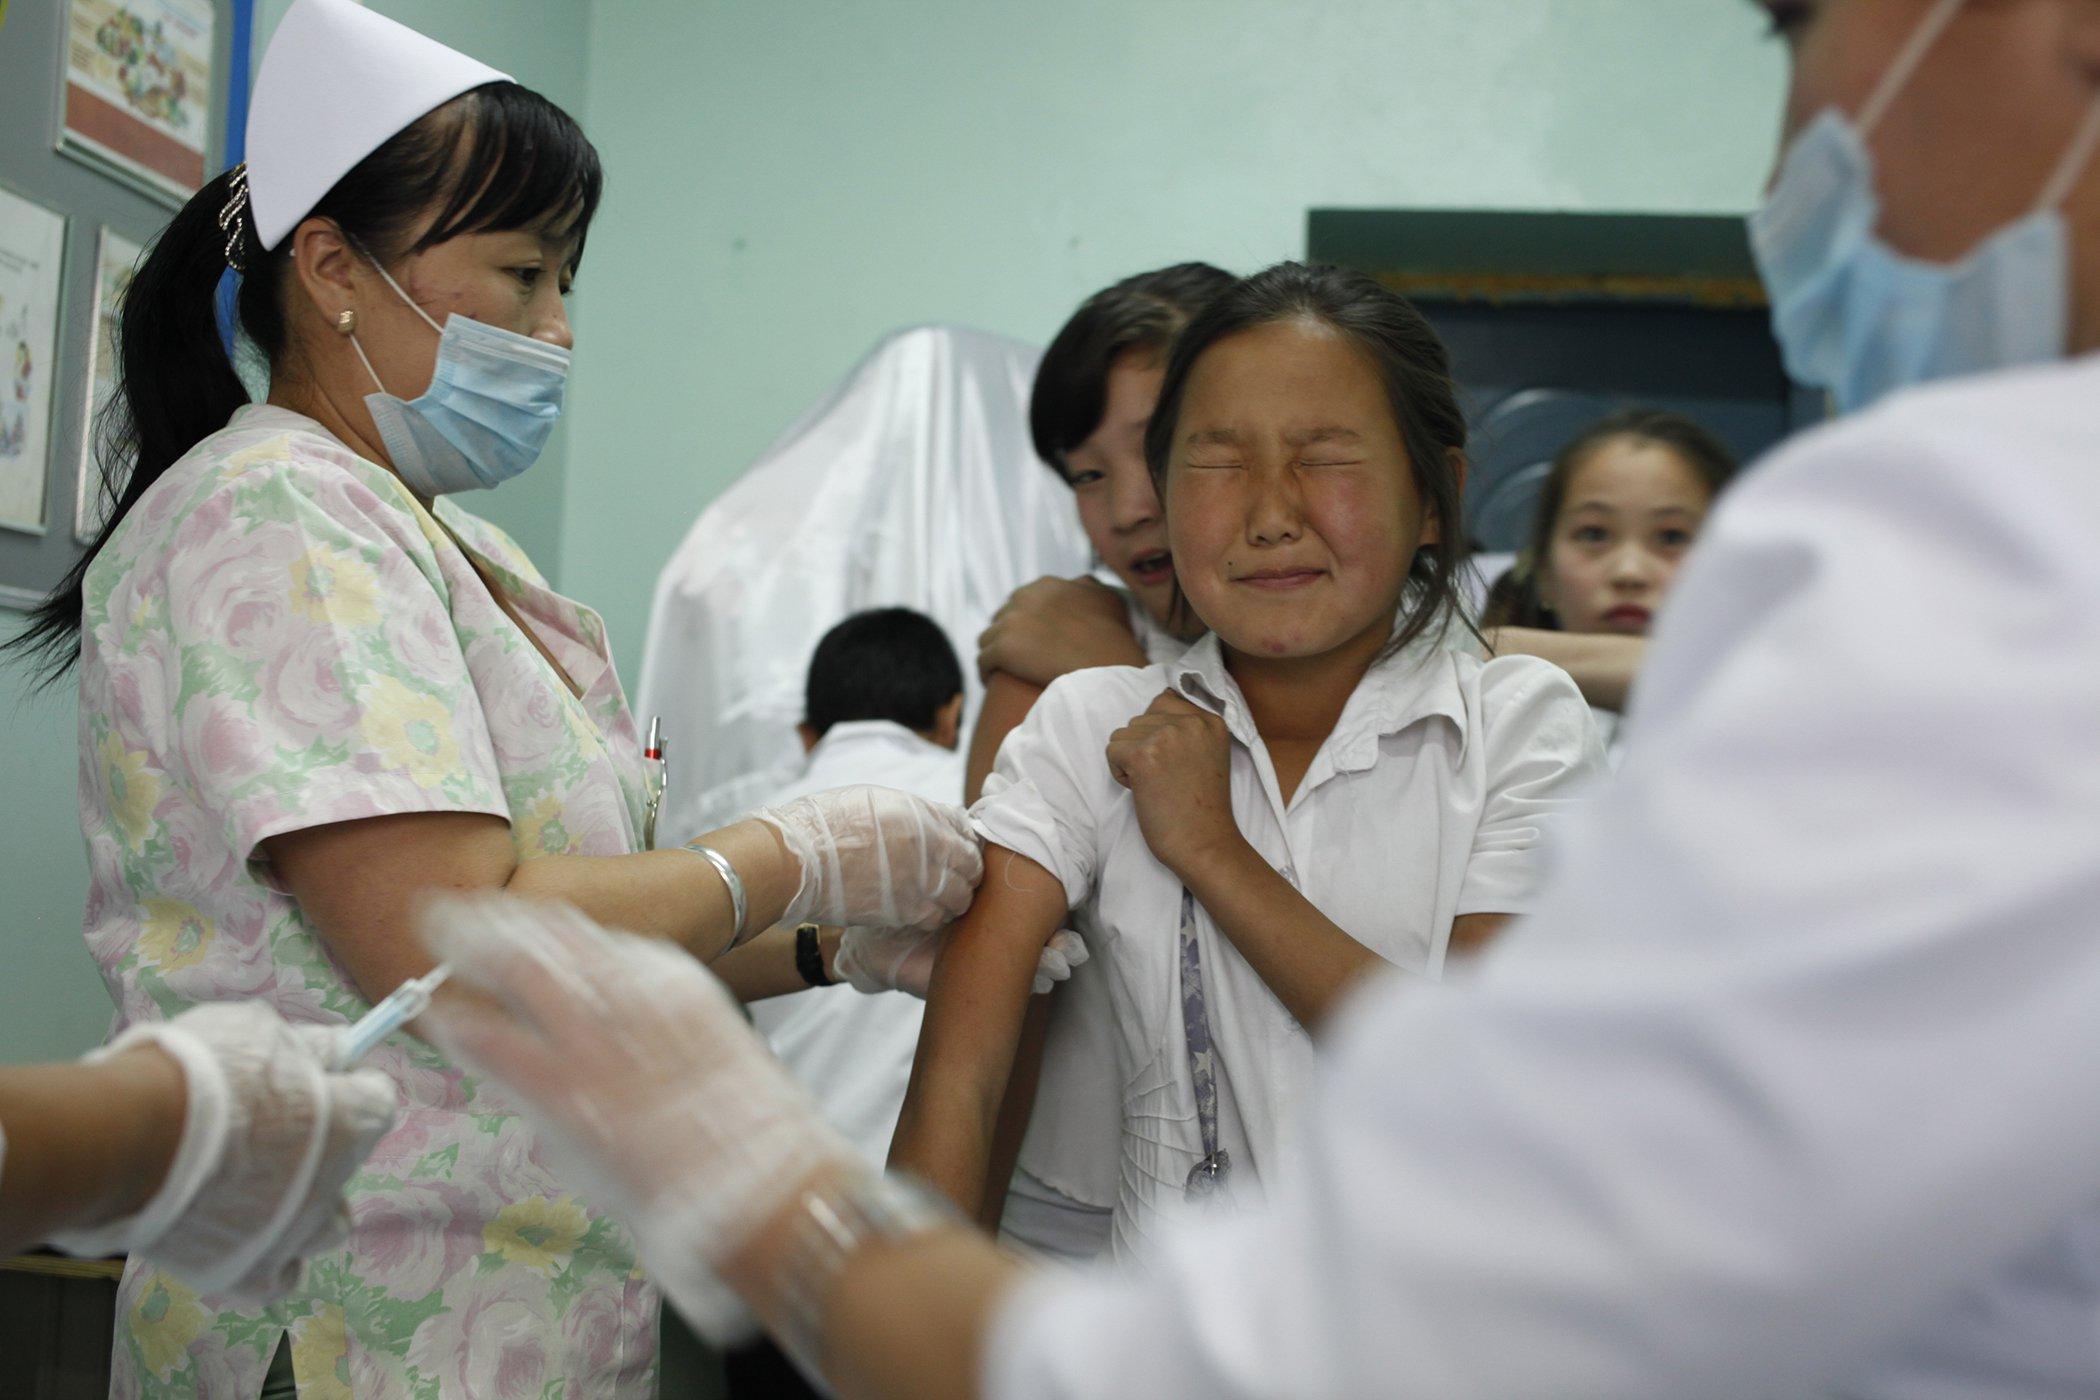 UNICEF_Vaccinations-Around-The-World_009.JPG